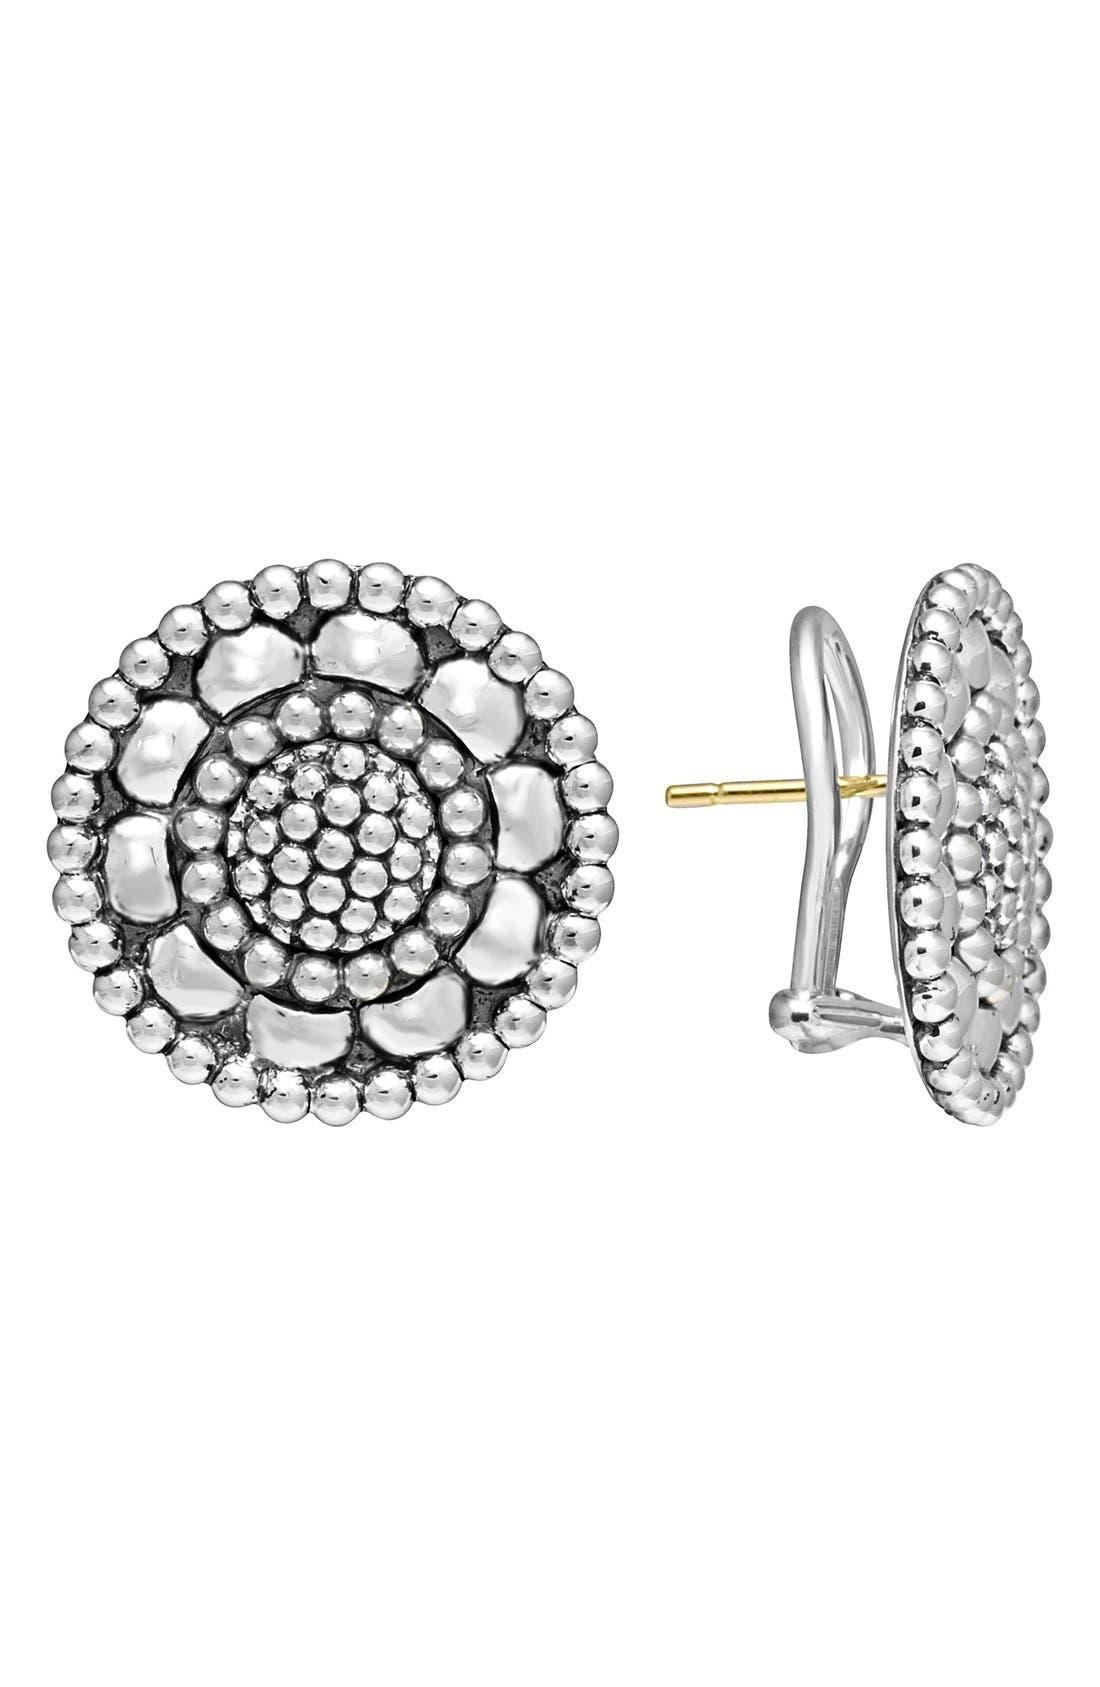 Main Image - LAGOS 'Voyage' Caviar Stud Earrings